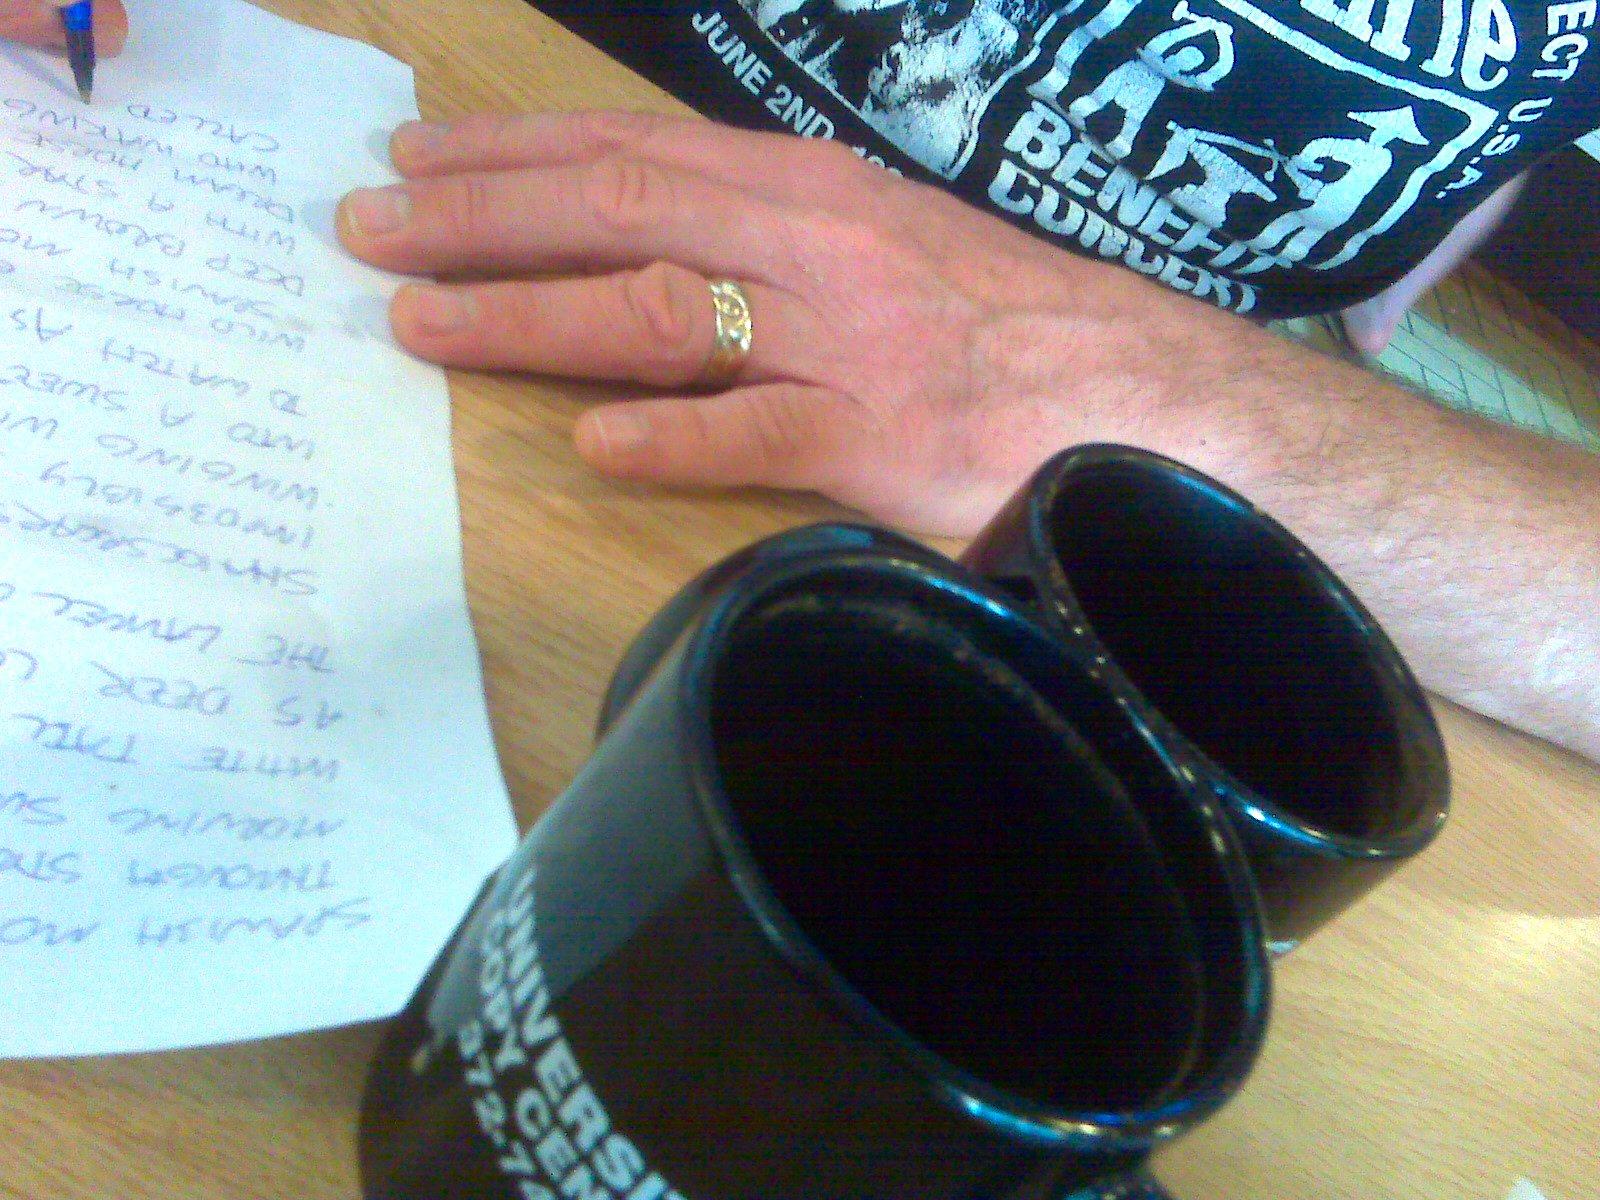 Greg writes an anniversary poem at Bageland